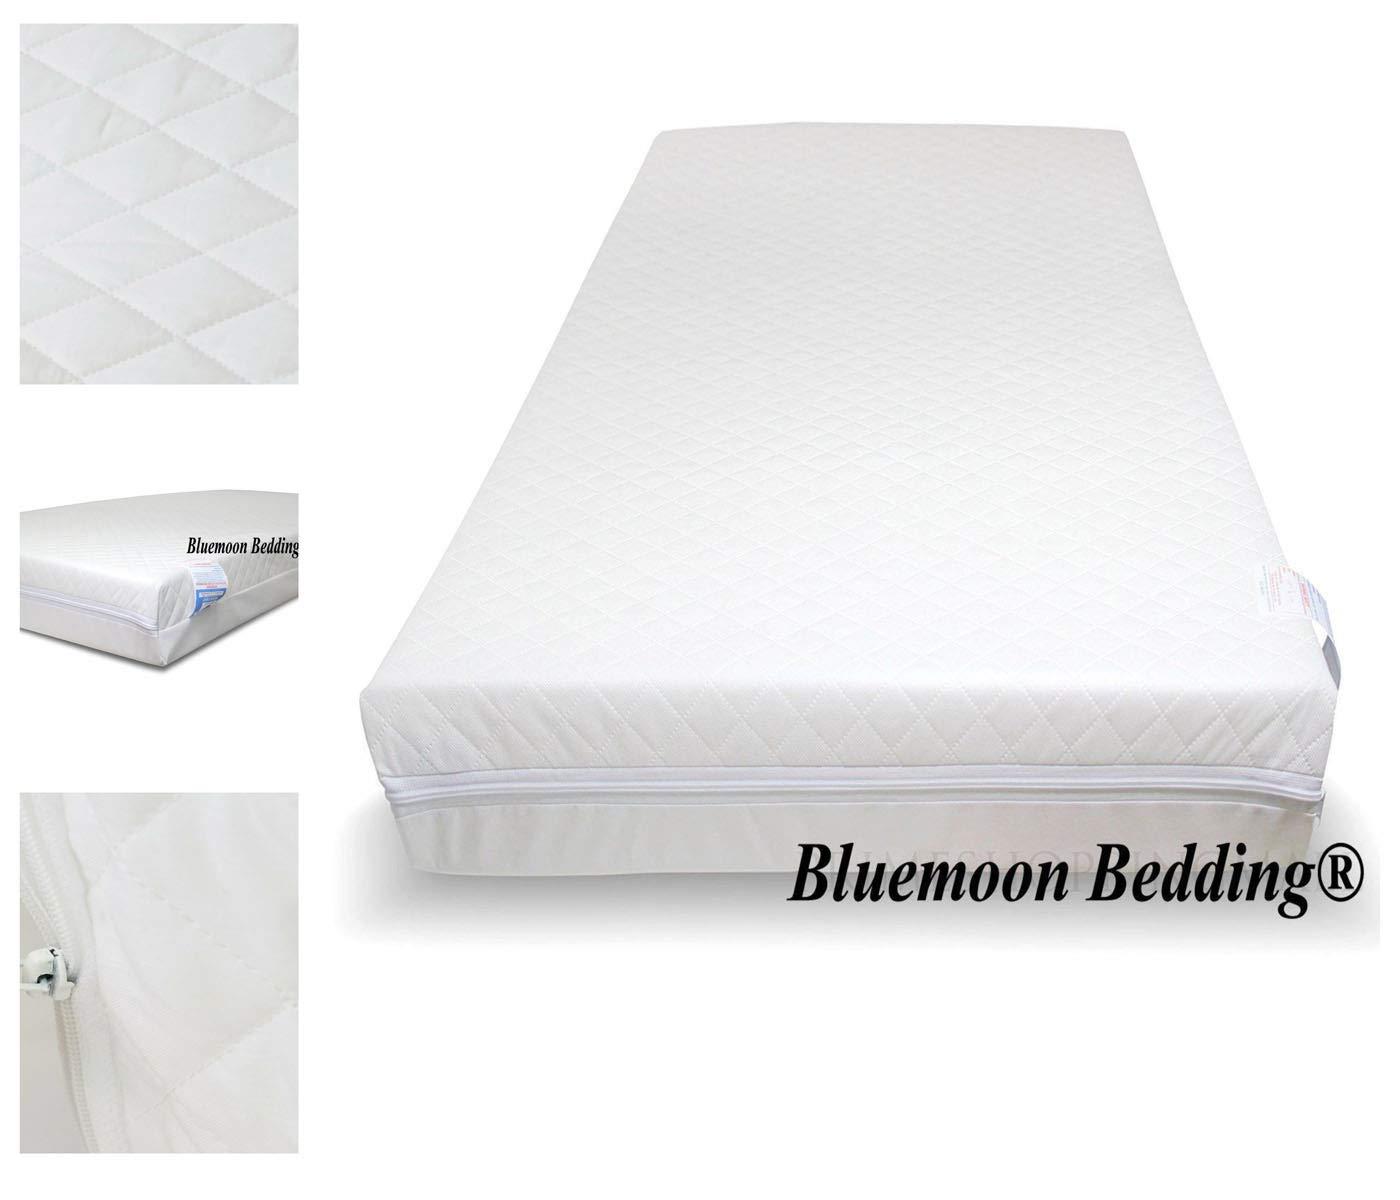 Bluemoon Bedding/® Baby Fully Breathable Nursery Foam Cot Mattress 126 x 62.5 x 10 cm